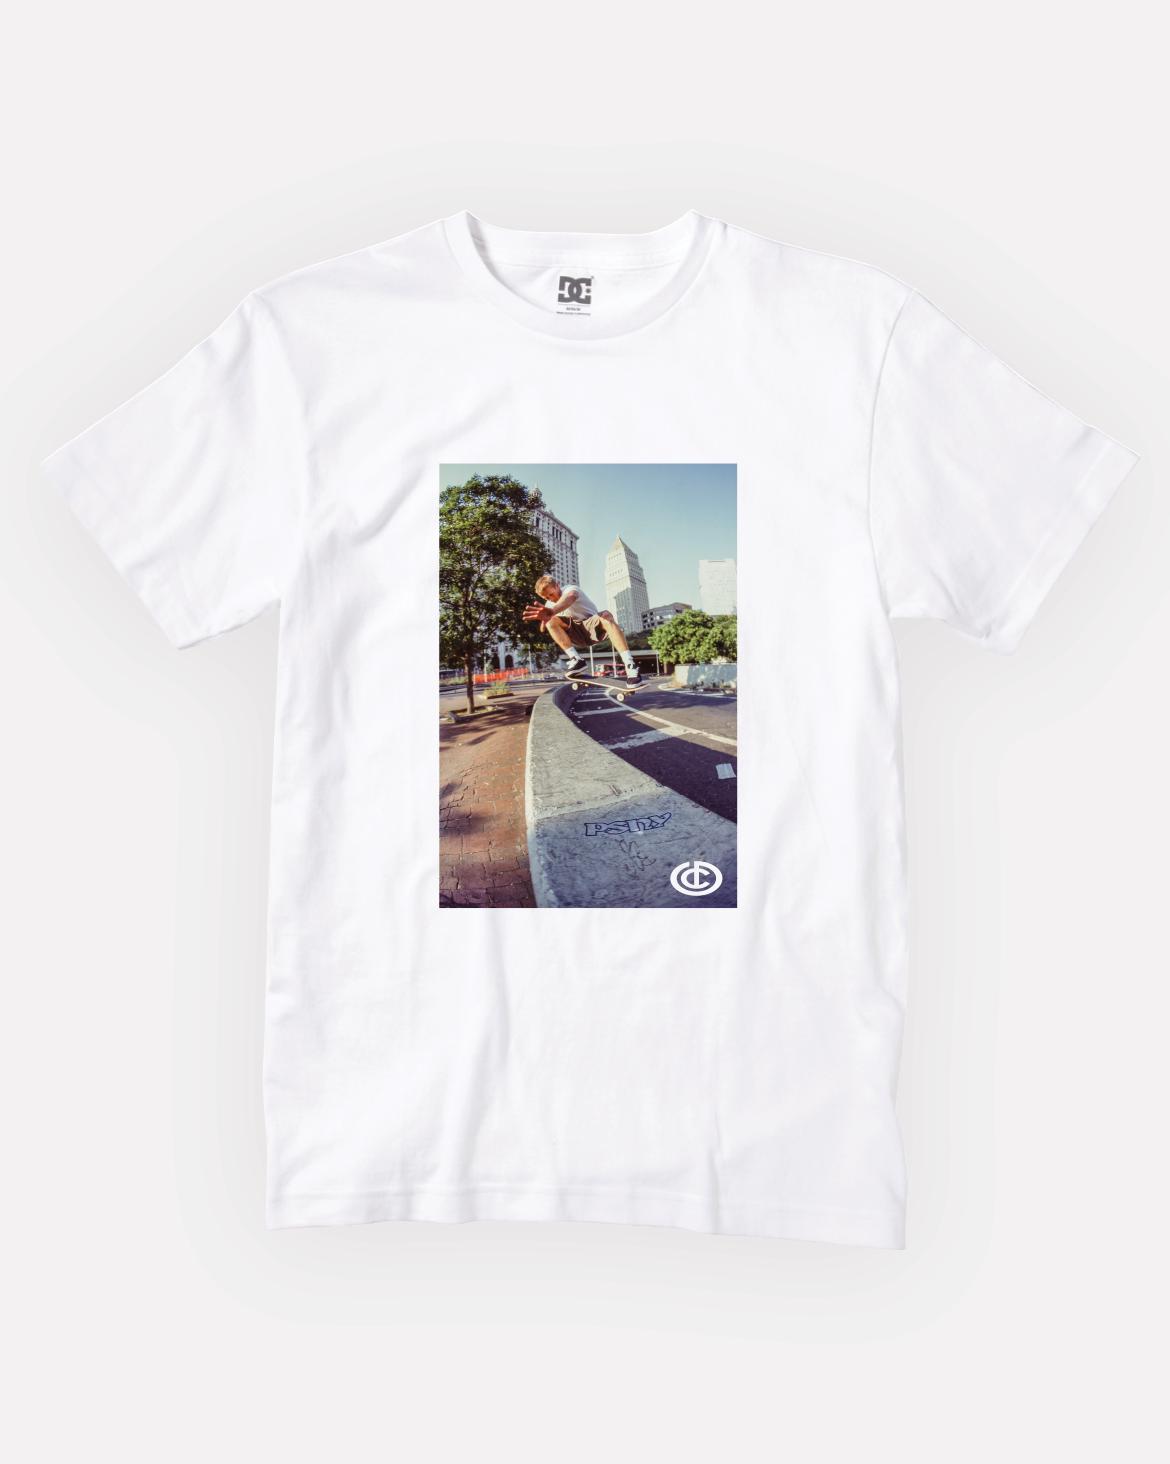 Danny Way c.1994 (Gunars Elmuts) limited t-shirt /100